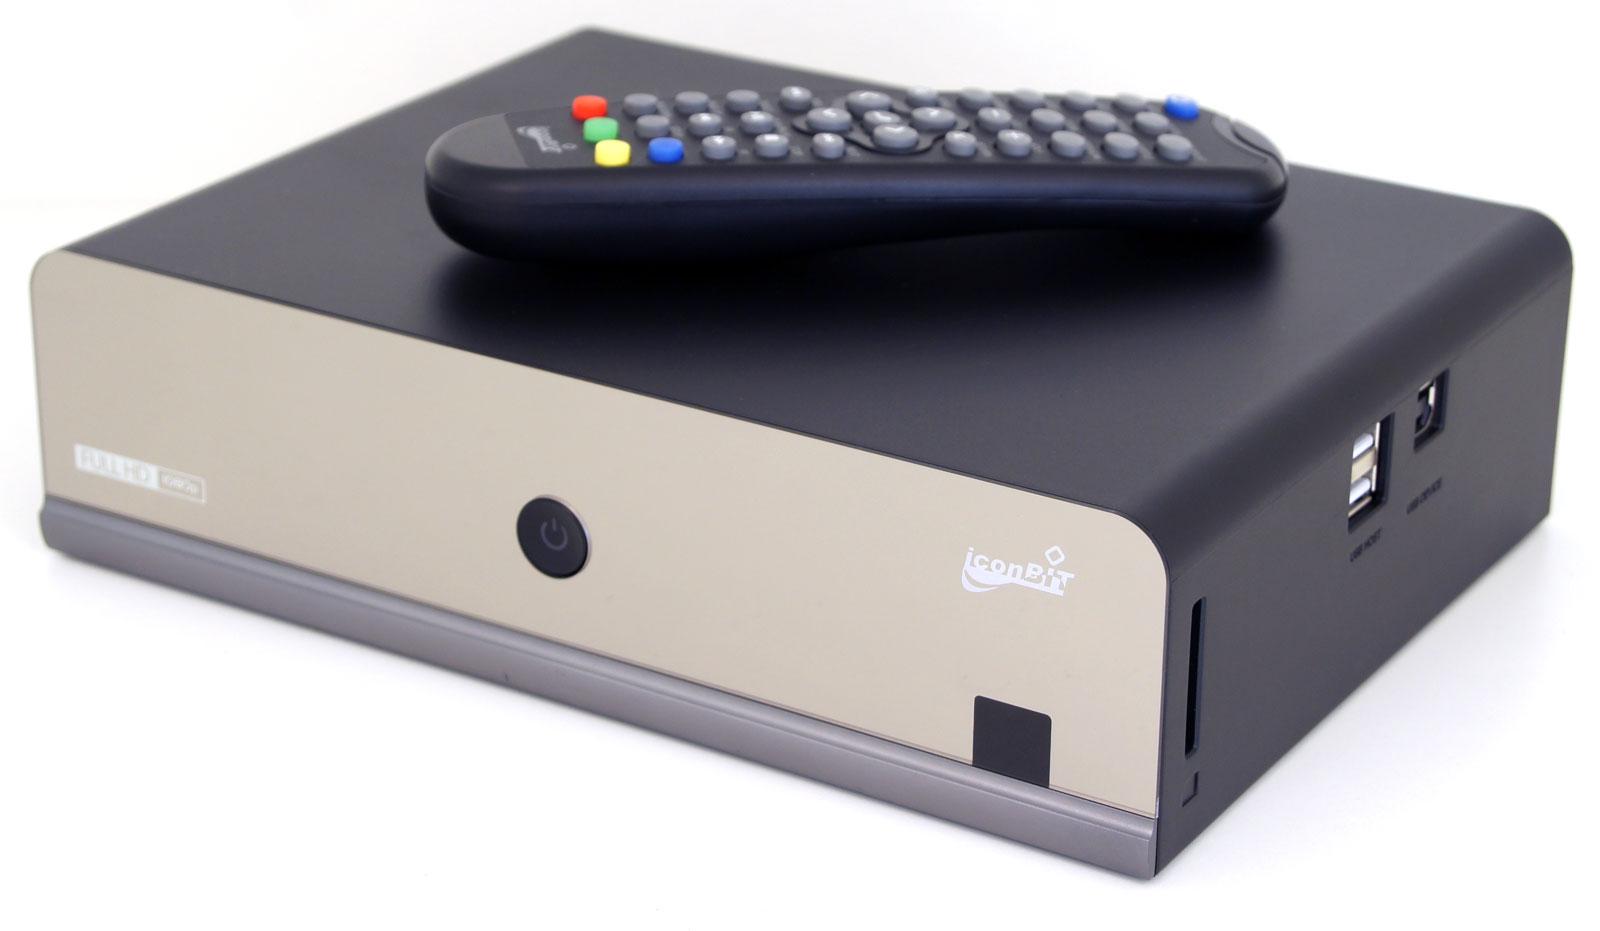 ICONBIT HDM35 HDMI MEDIA PLAYER DRIVER WINDOWS 7 (2019)